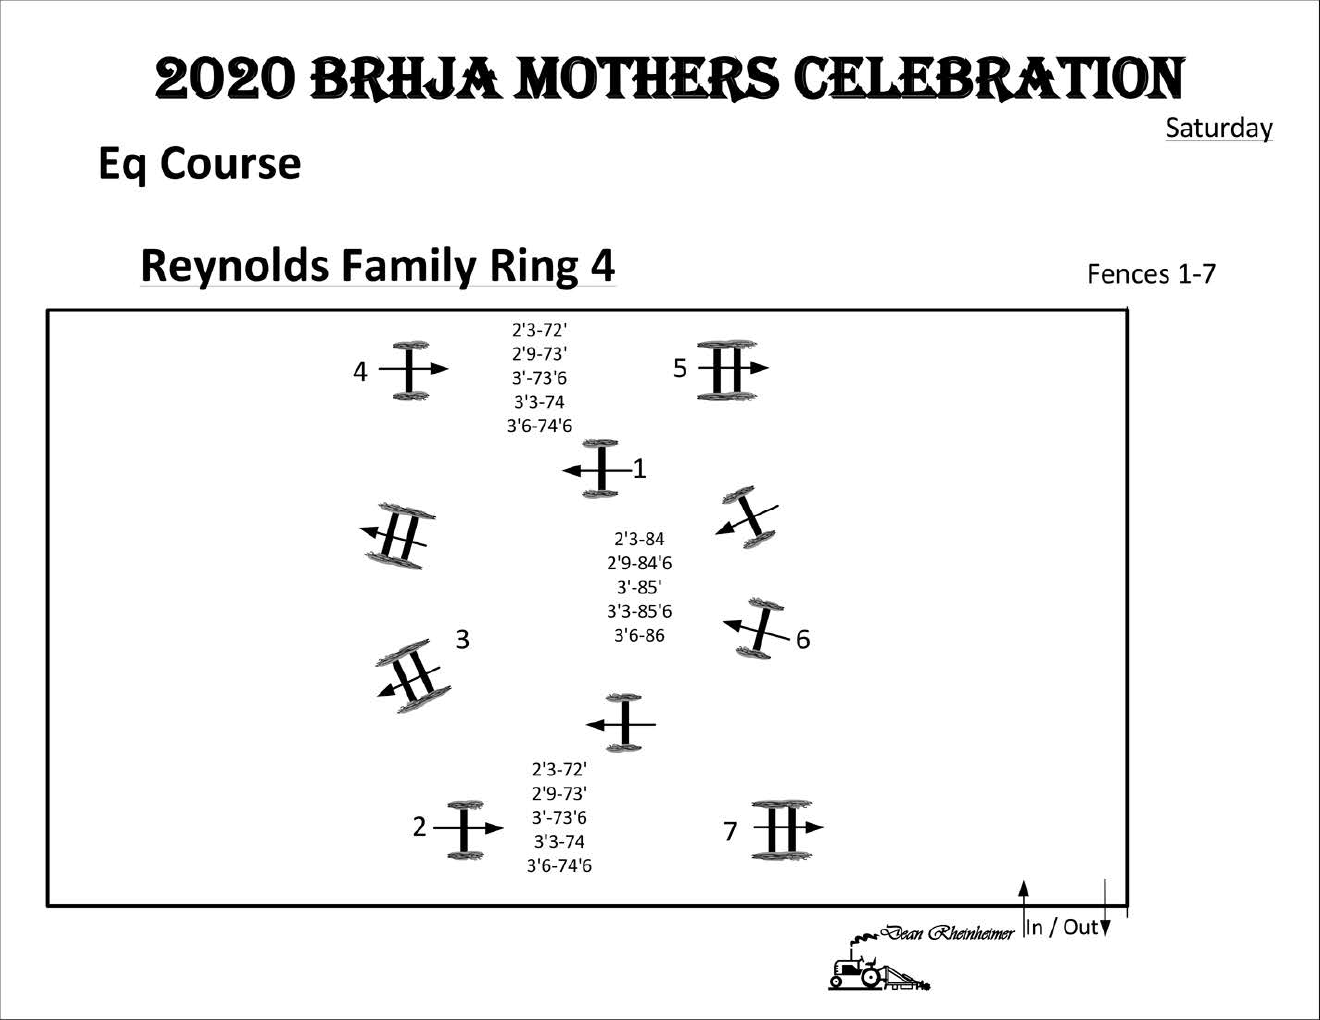 SingleOxer.com BRHJA Mothers Celebration Saturday 5-30 Ring 4 Adult Equitation